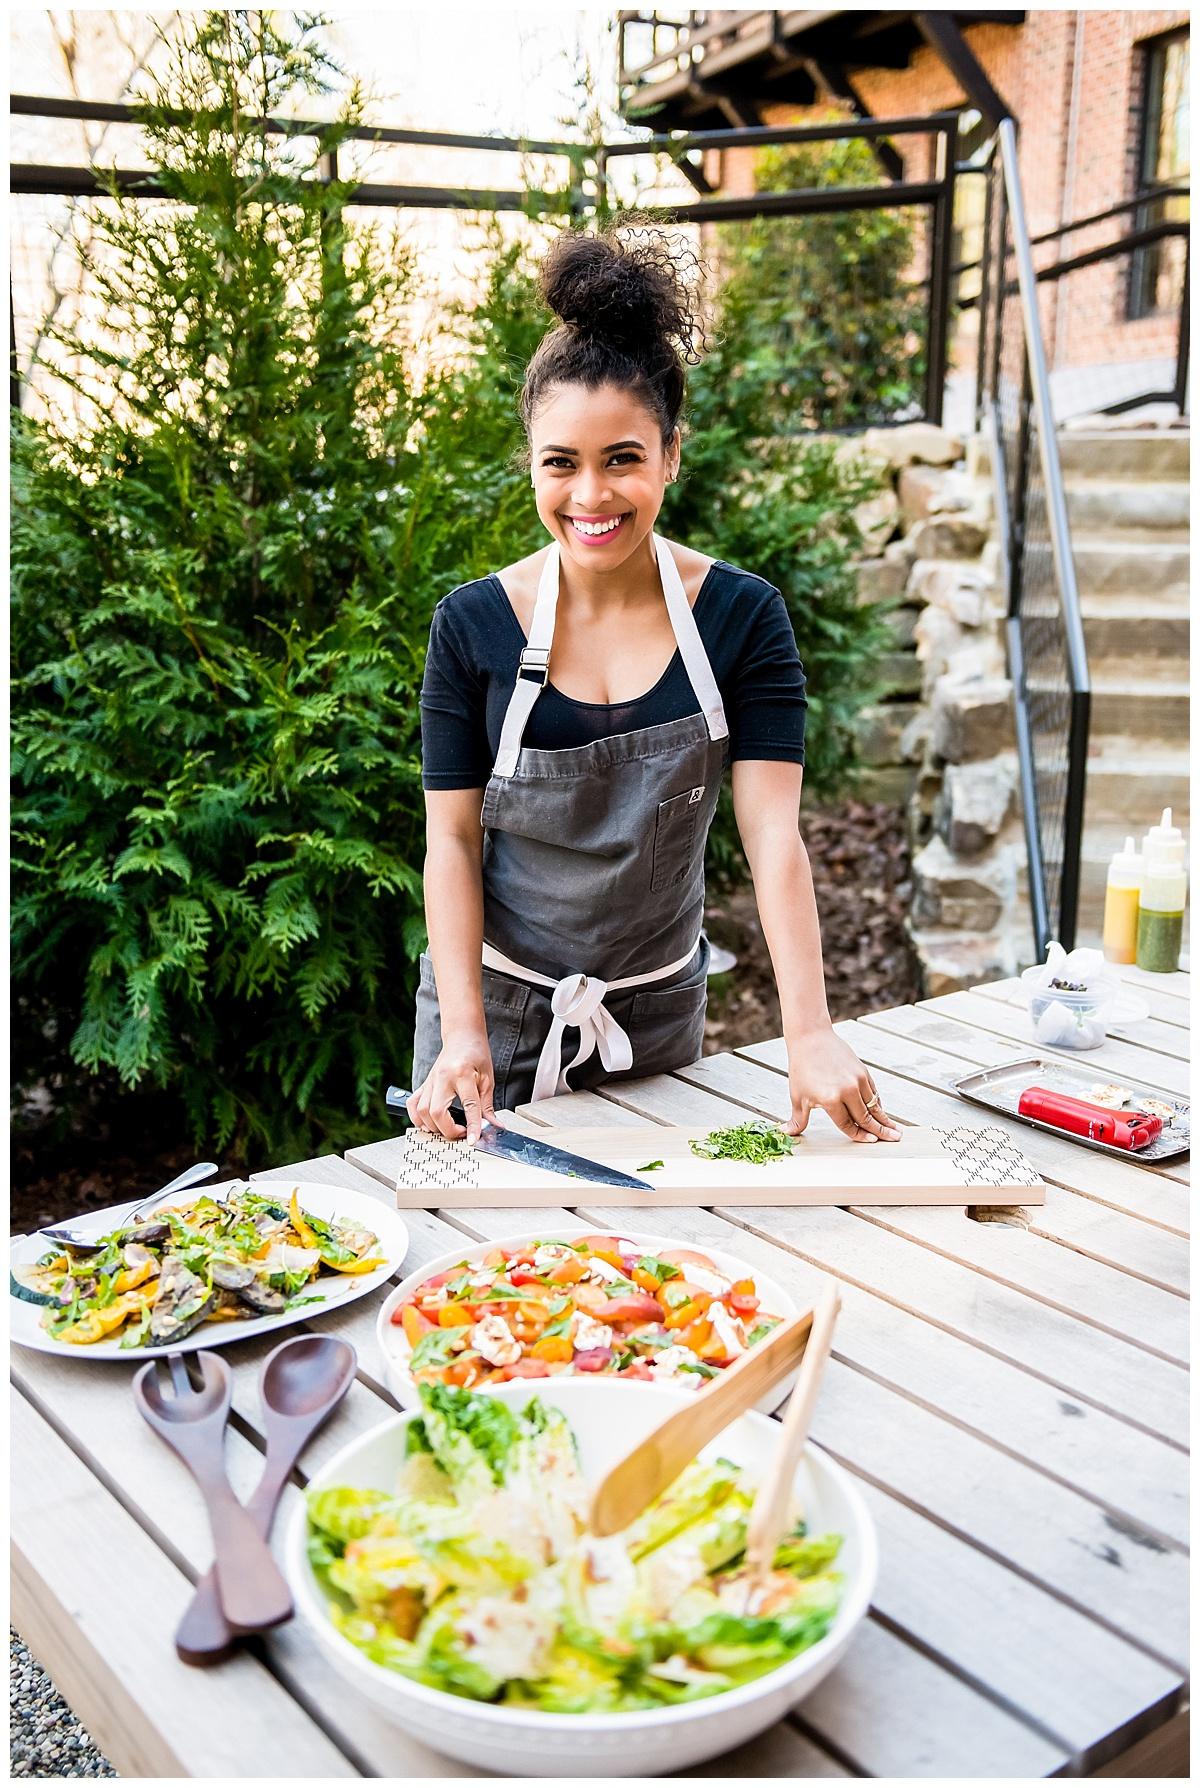 Summer Recipes: Salads & Prosecco Sorbet with Chef Christan Willis  |  Lemiga Events